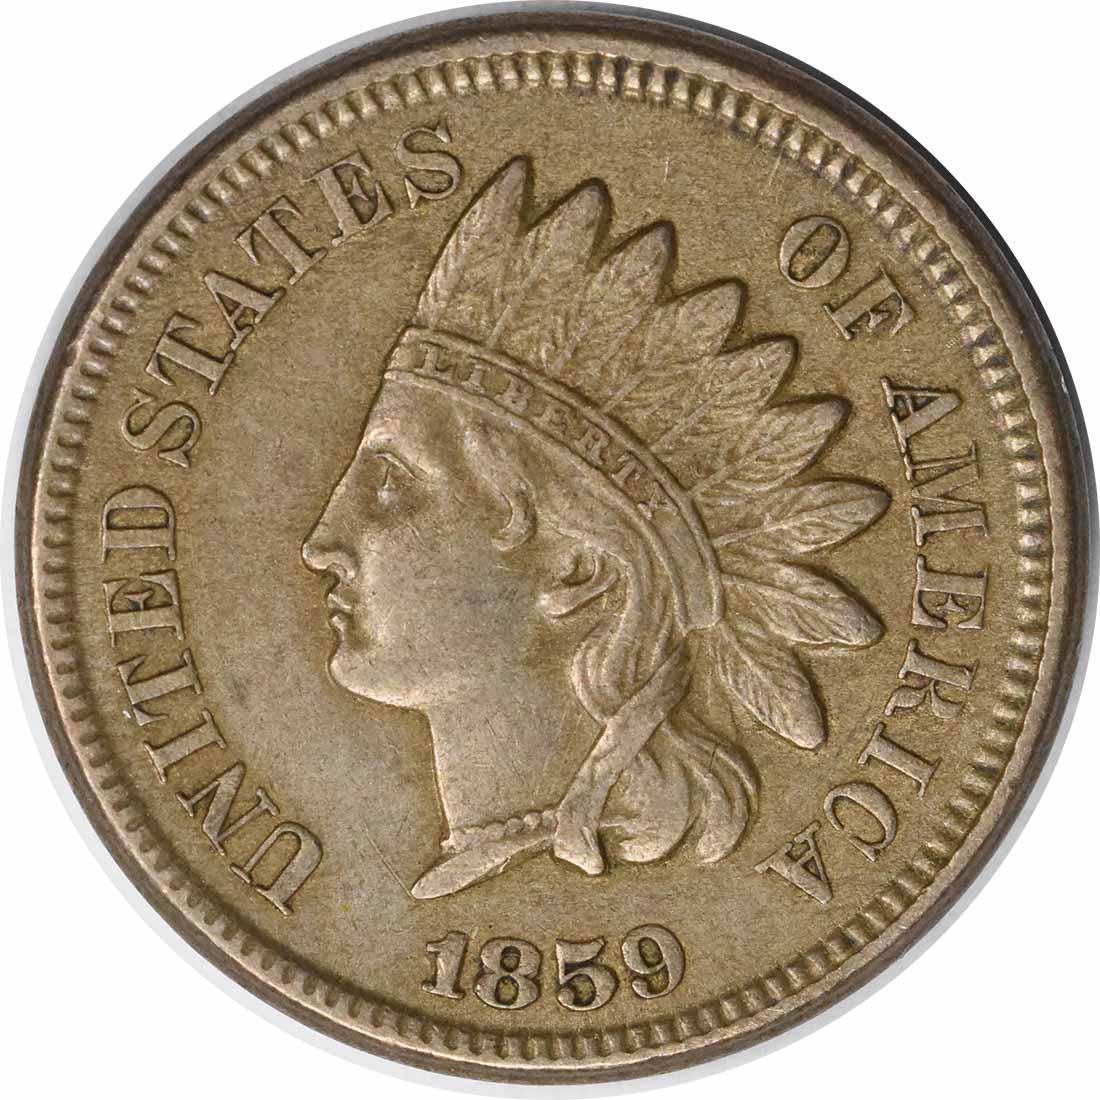 1859/1859 Indian Cent S-2 FS-302 AU Uncertified #111